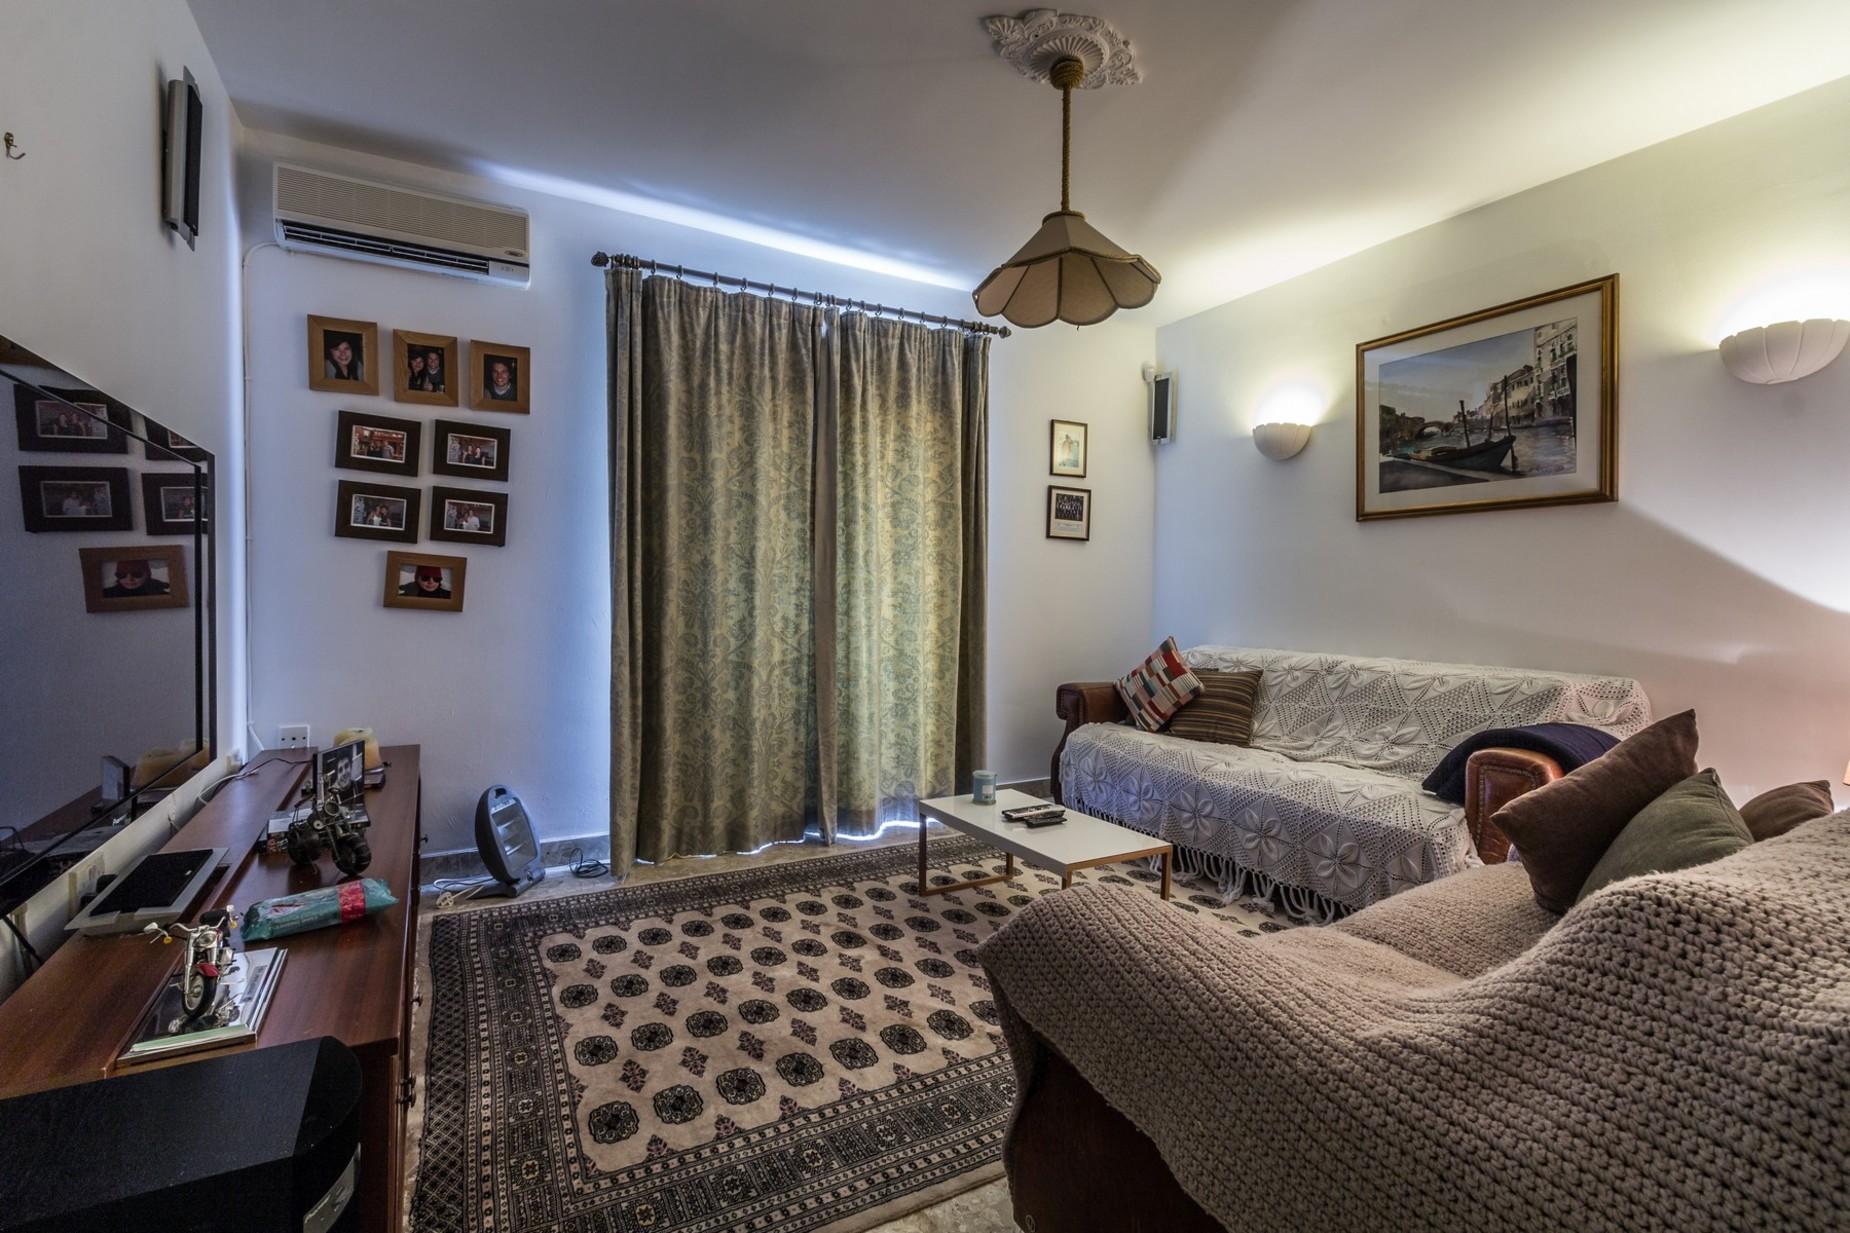 4 bed Villa For Sale in Bahar ic-Caghaq, Bahar ic-Caghaq - thumb 15